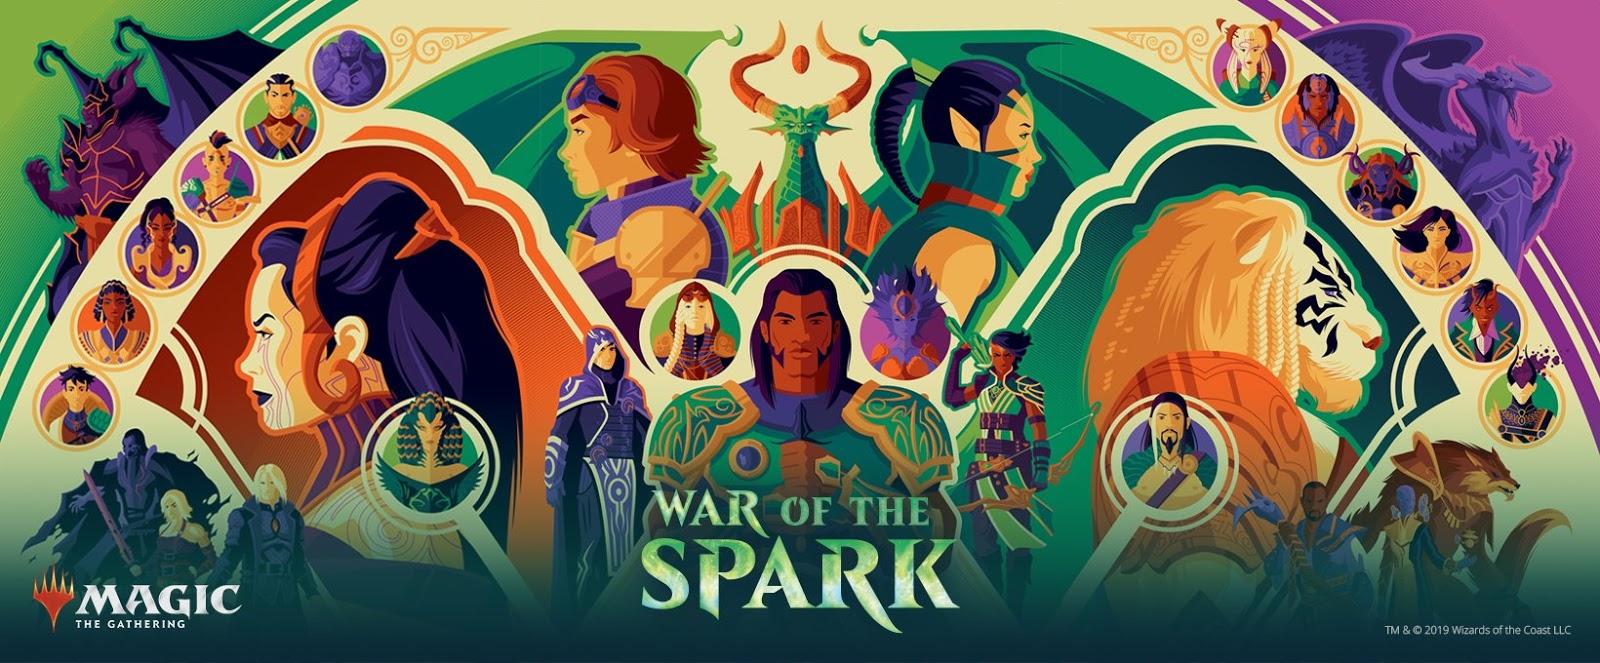 cc6835ac94d32 The Geeky Nerfherder: #CoolArt: 'Magic: The Gathering - War Of The ...